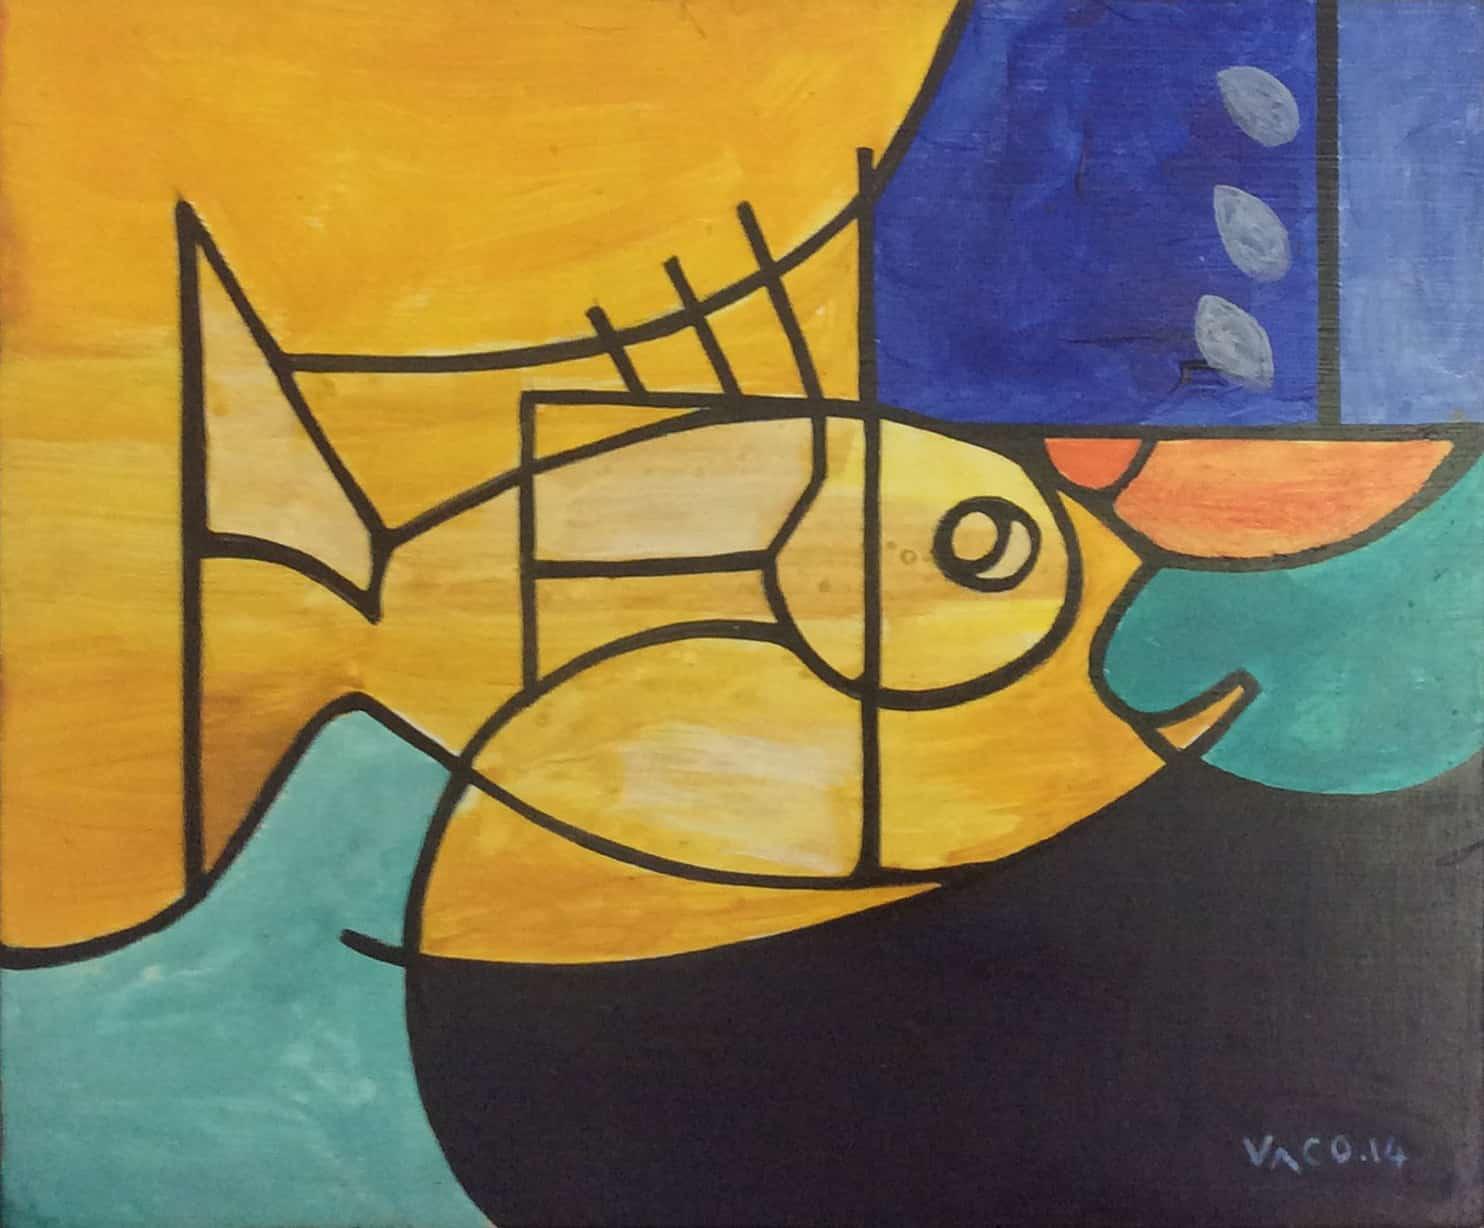 mauritius_arts_vaco_baissac_le_poisson_jaune